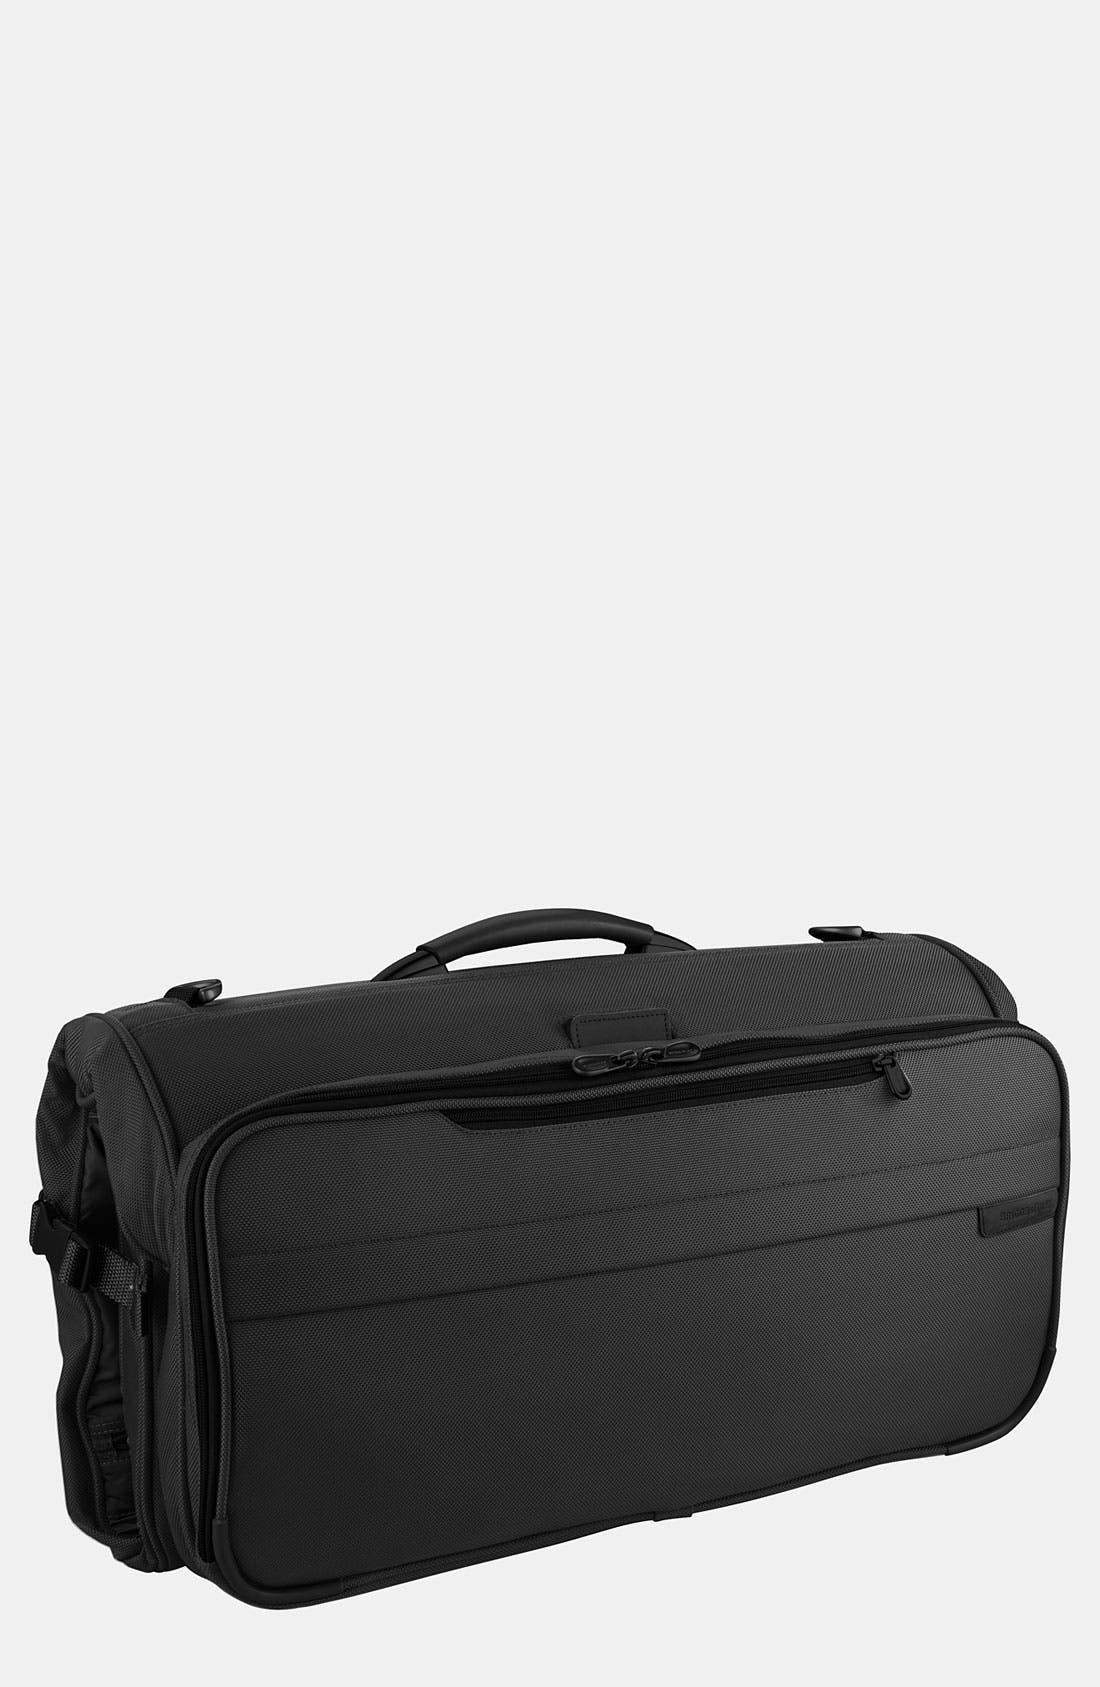 Baseline - Compact Garment Bag,                         Main,                         color, BLACK